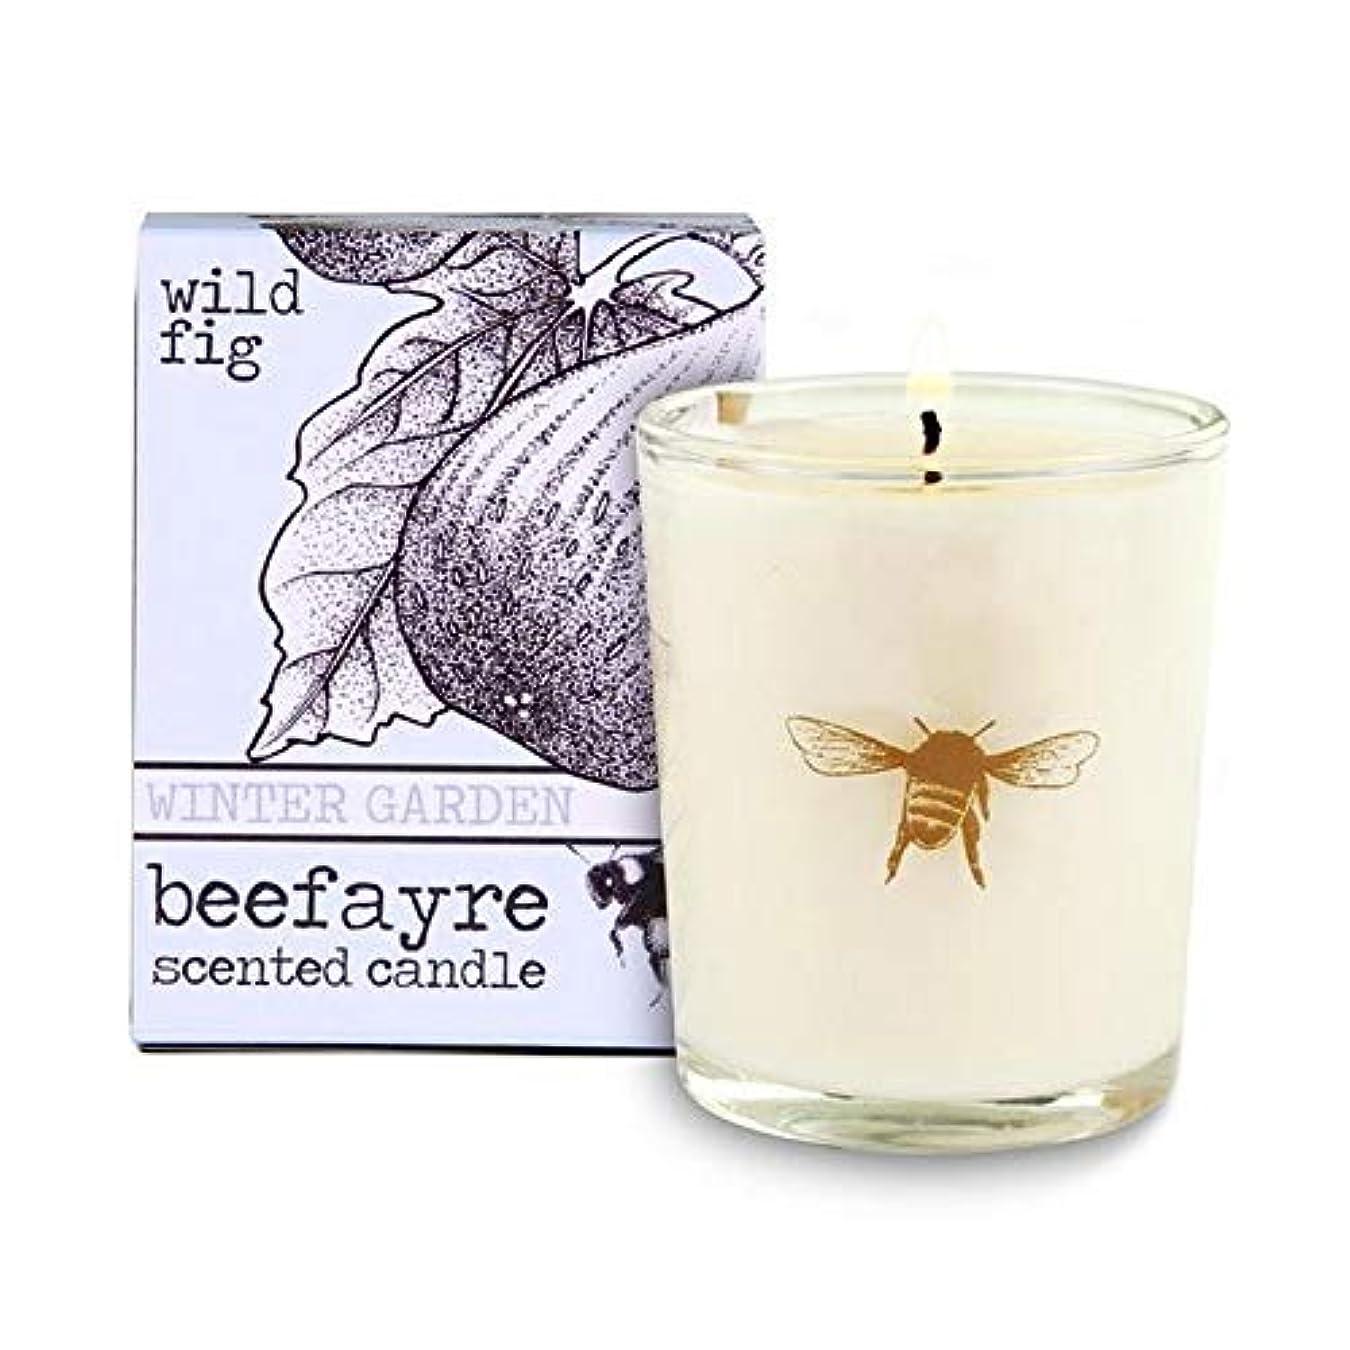 [Beefayre] 野生のイチジク小さな香りのキャンドルBeefayre - Beefayre Wild Fig Small Scented Candle [並行輸入品]